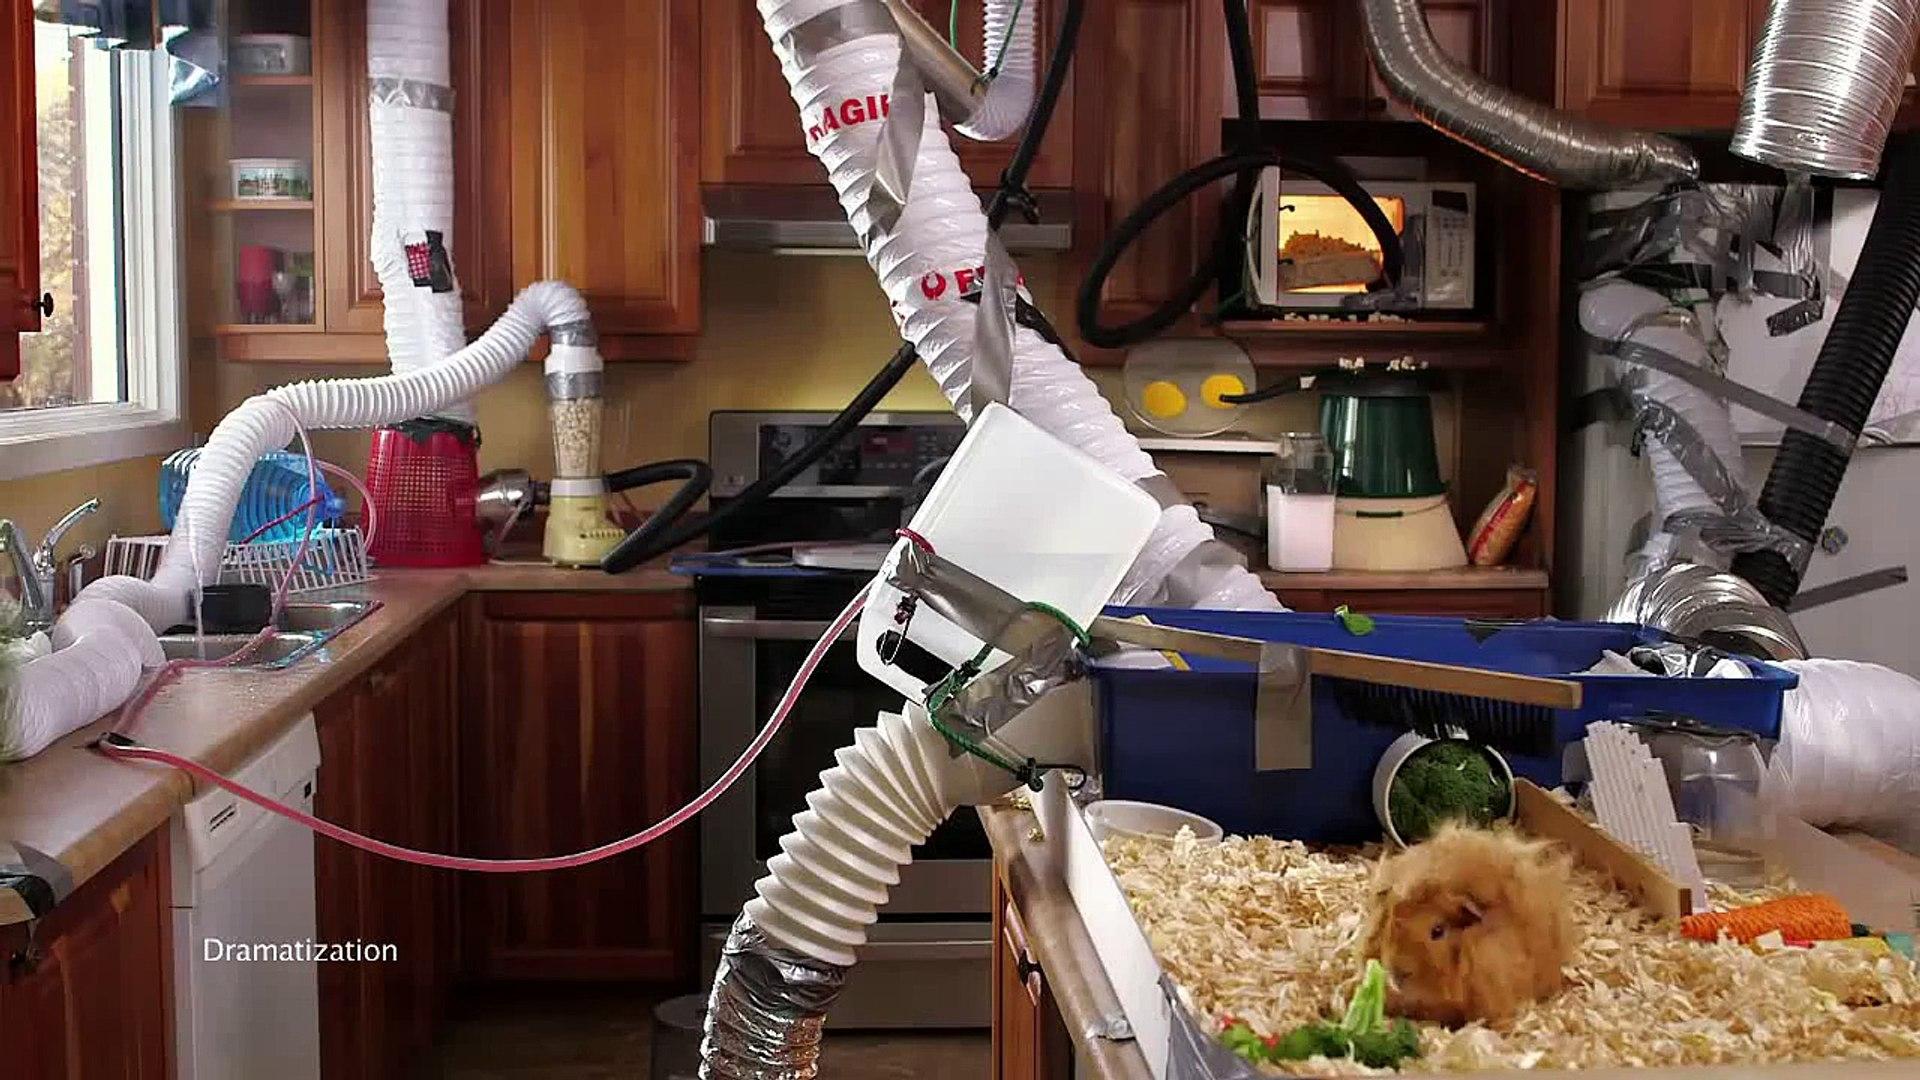 Kijiji TV Commercial - The Kid Mess